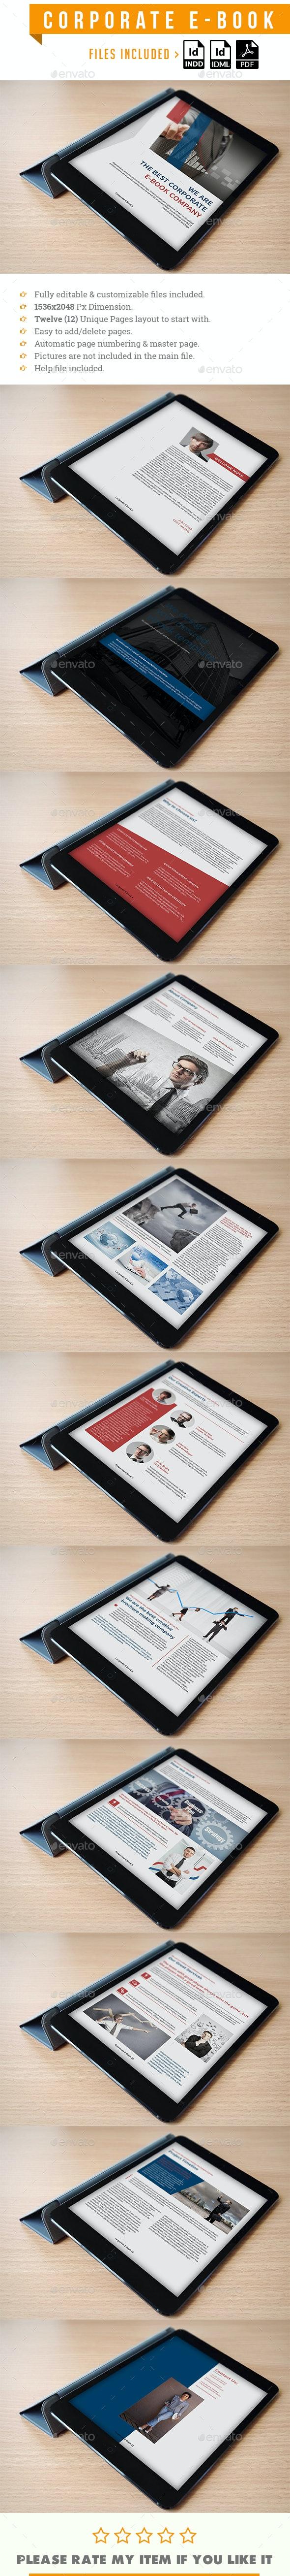 Corporate E-Book Template - Digital Books ePublishing